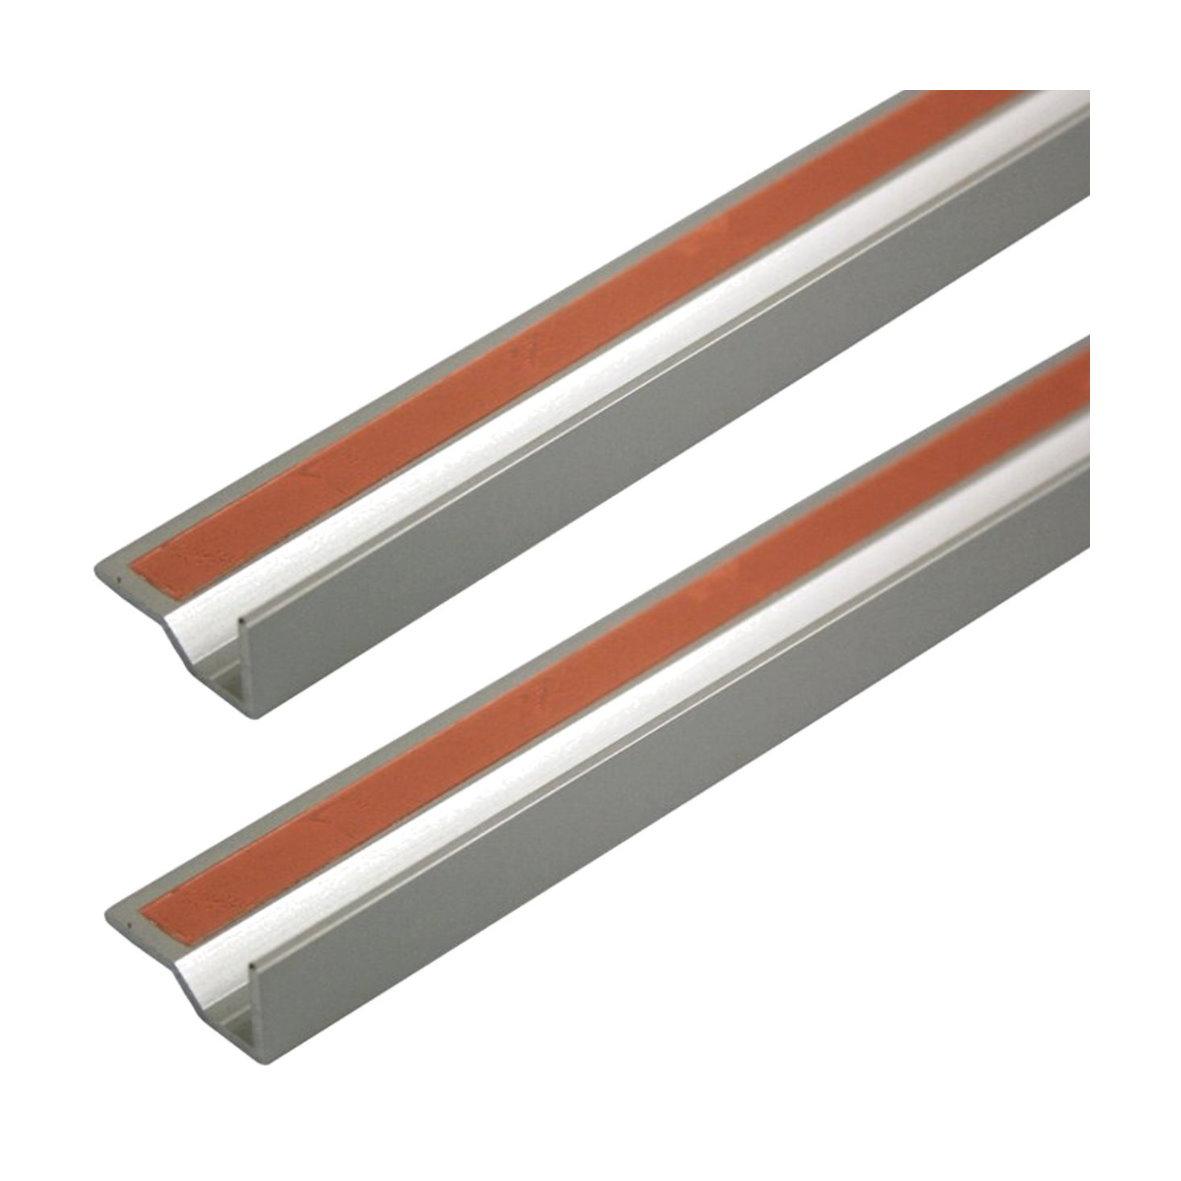 hera 2x led alu glasprofil profil aluprofil aluminium strip streifen vitrine ebay. Black Bedroom Furniture Sets. Home Design Ideas